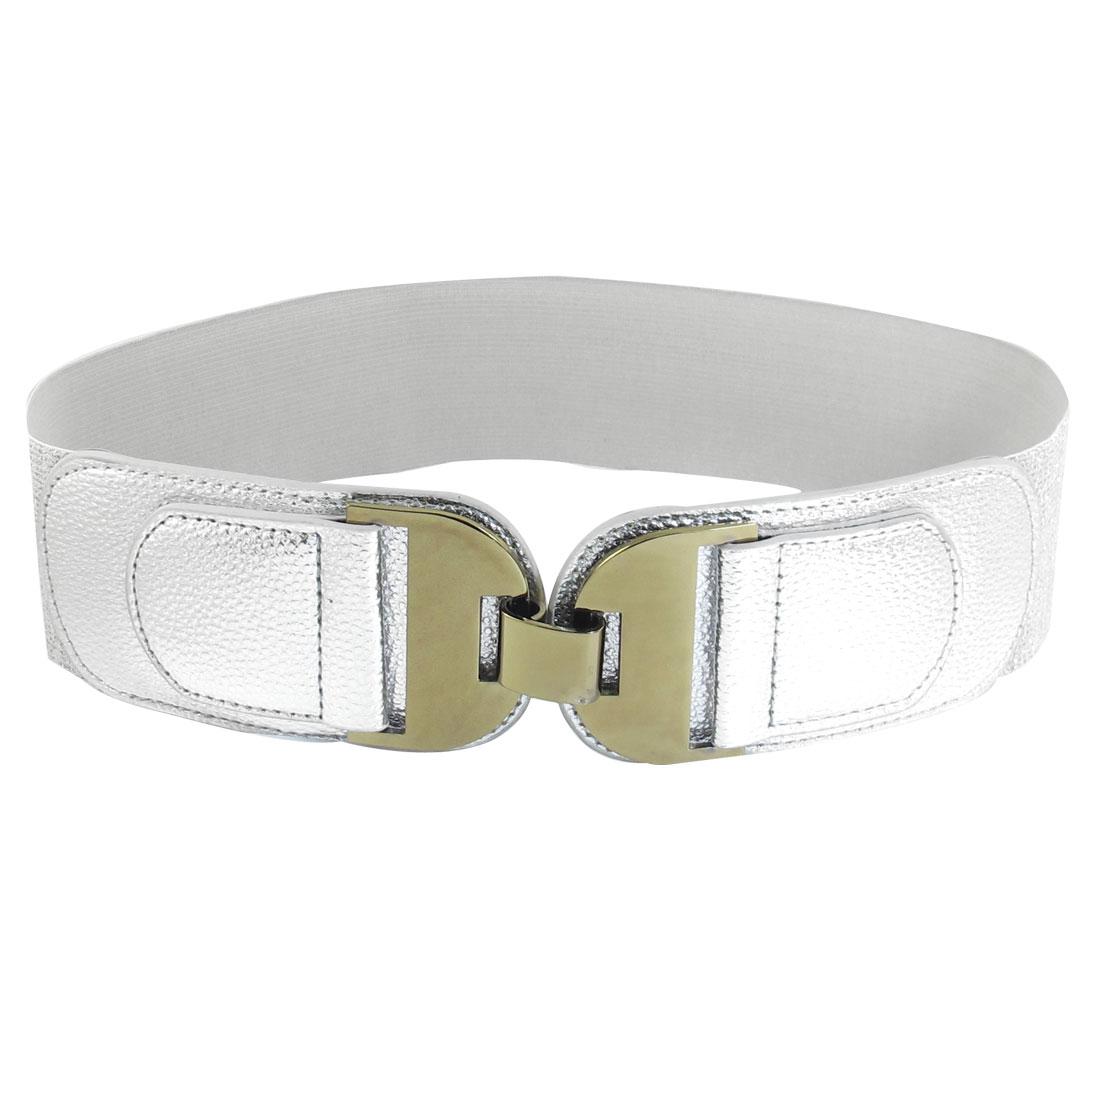 Silver Tone Dual D Shaped Metal Interlocking Buckle Glitter Elastic Cinch Belt